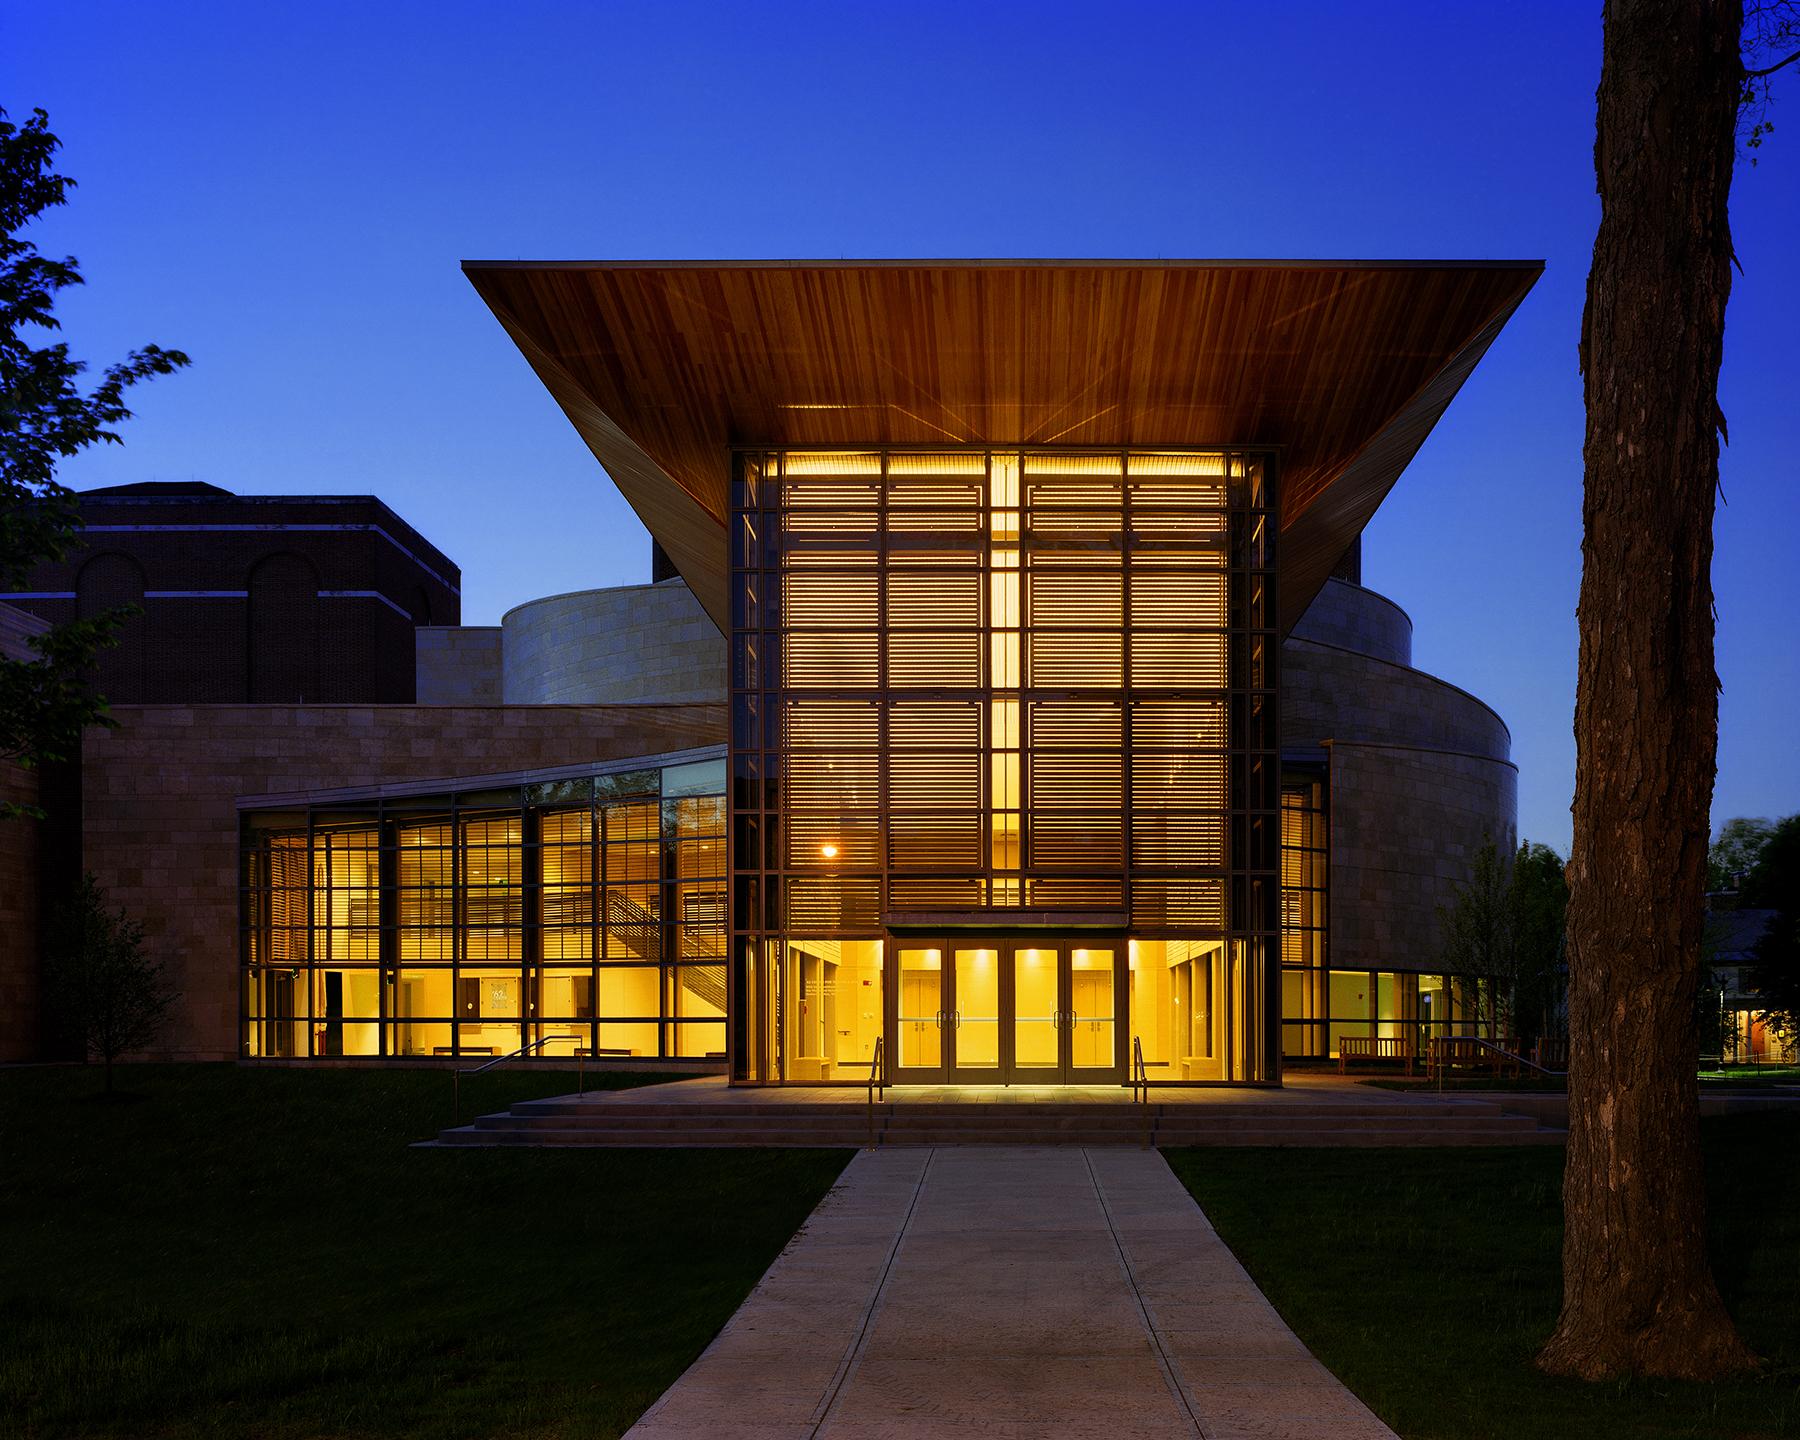 Williams-College-62-Center-Alan-Joslin-01.jpg